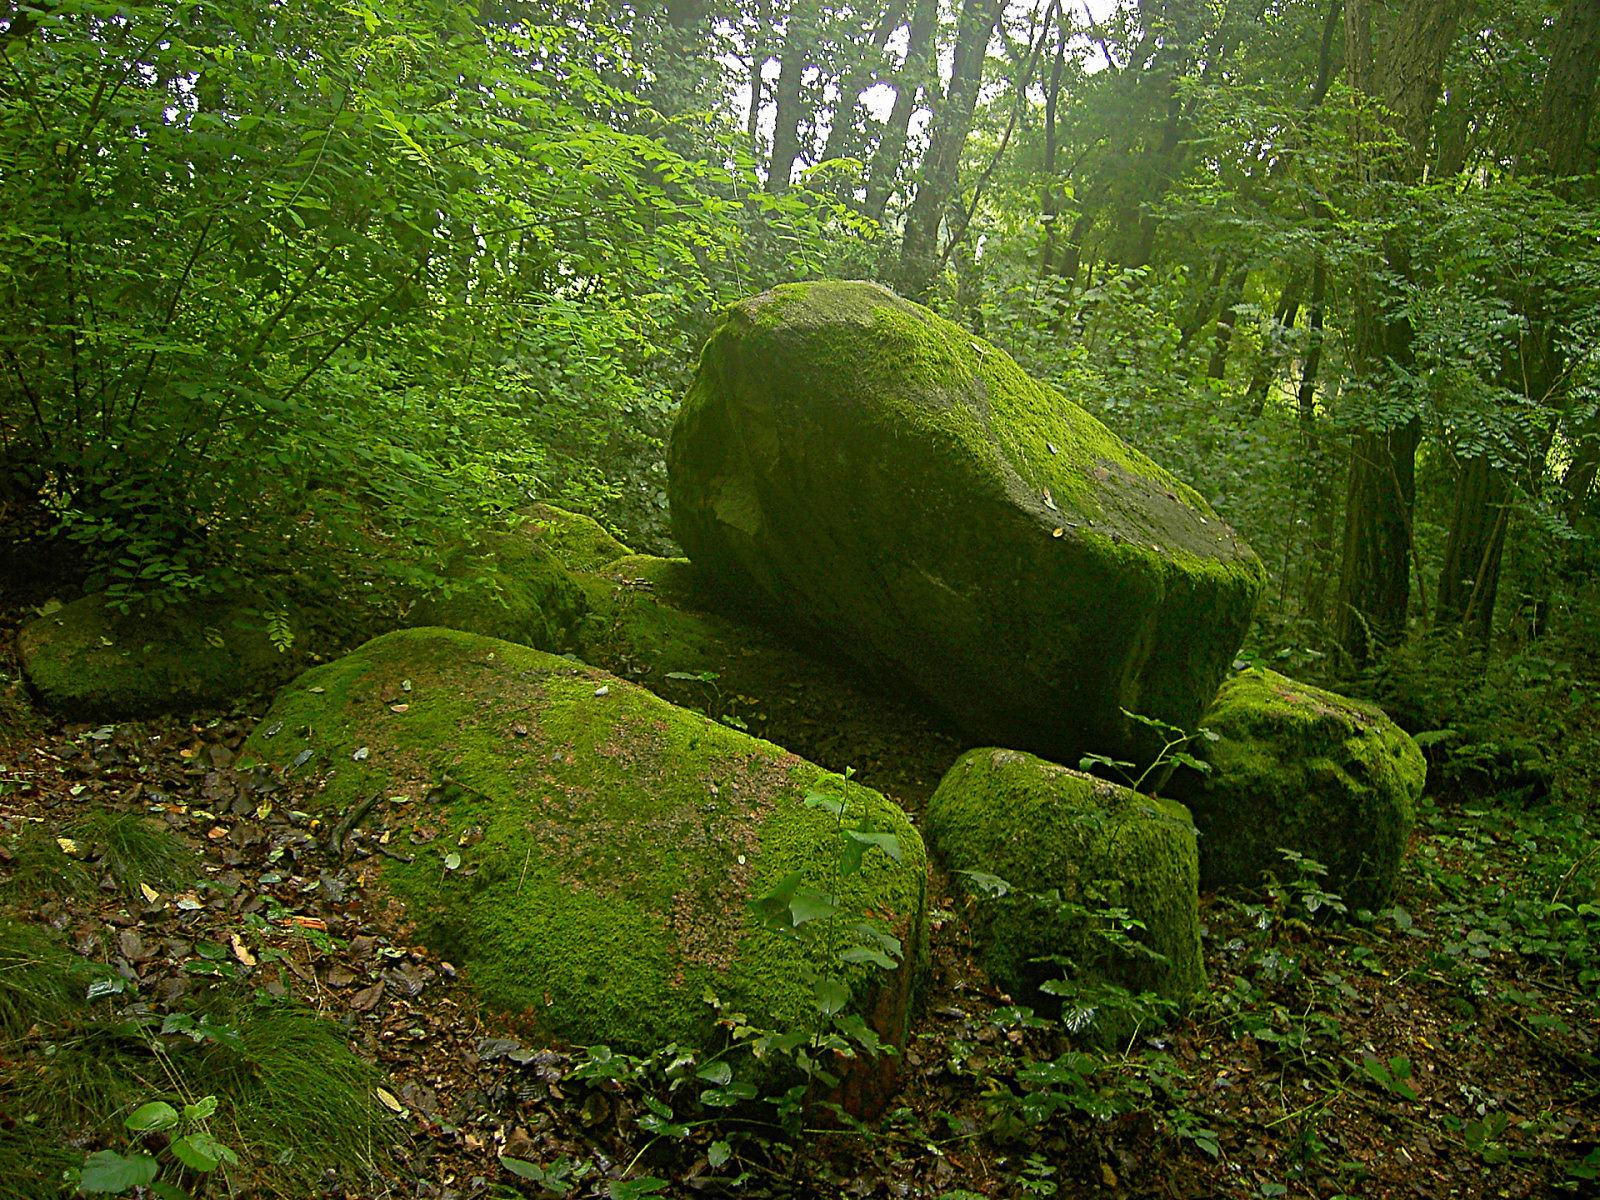 https://1.bp.blogspot.com/-LraSSyQtW6Y/TVQwe7E2biI/AAAAAAAAF-o/9Z9rZjDHqBE/s1600/HD+Wallpaper+greenery.jpg